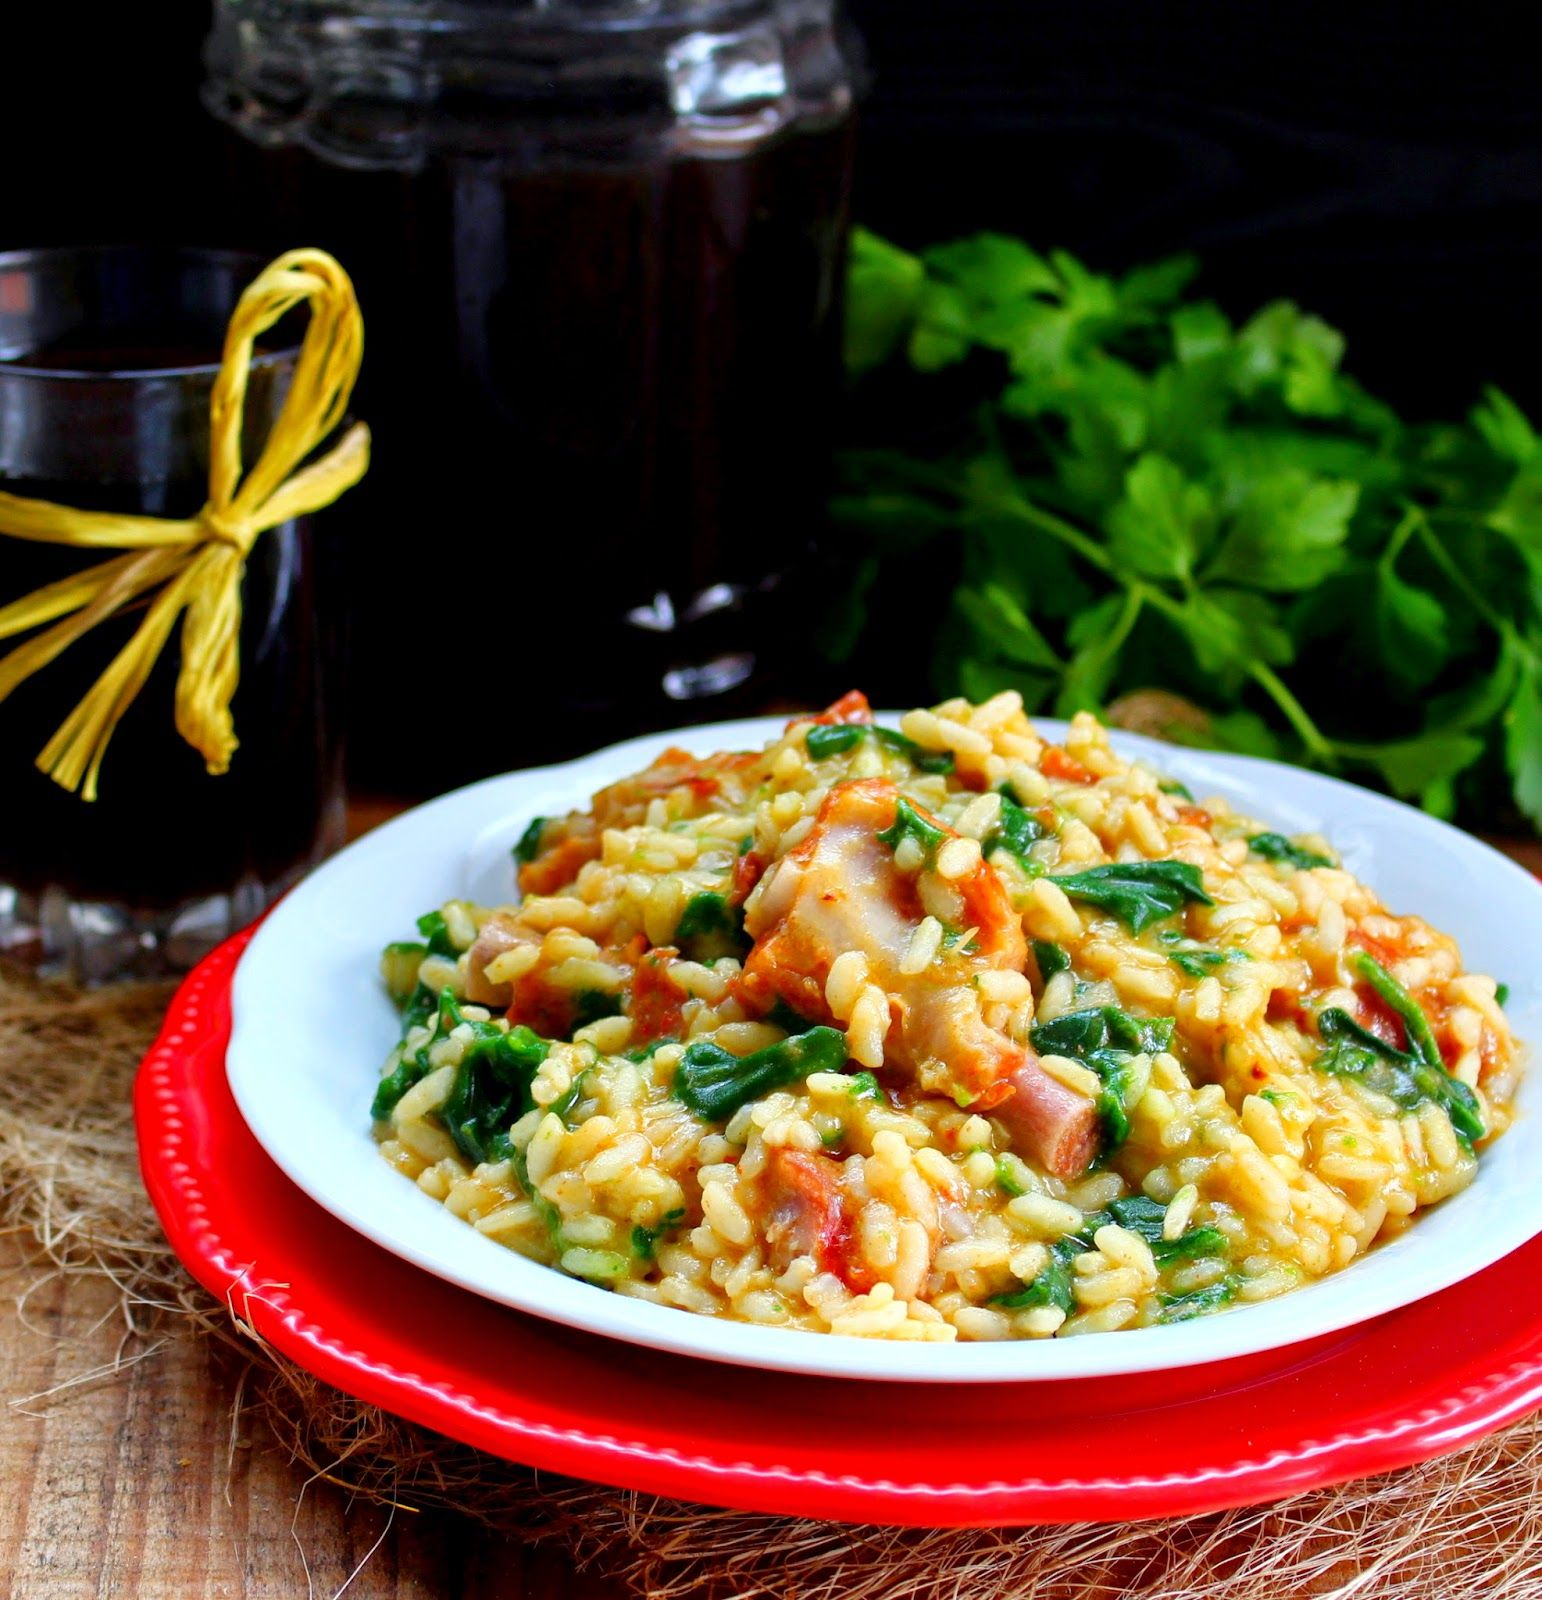 Nárwen's Cuisine: Risotto de Botelo com Tomate Seco e Espinafres